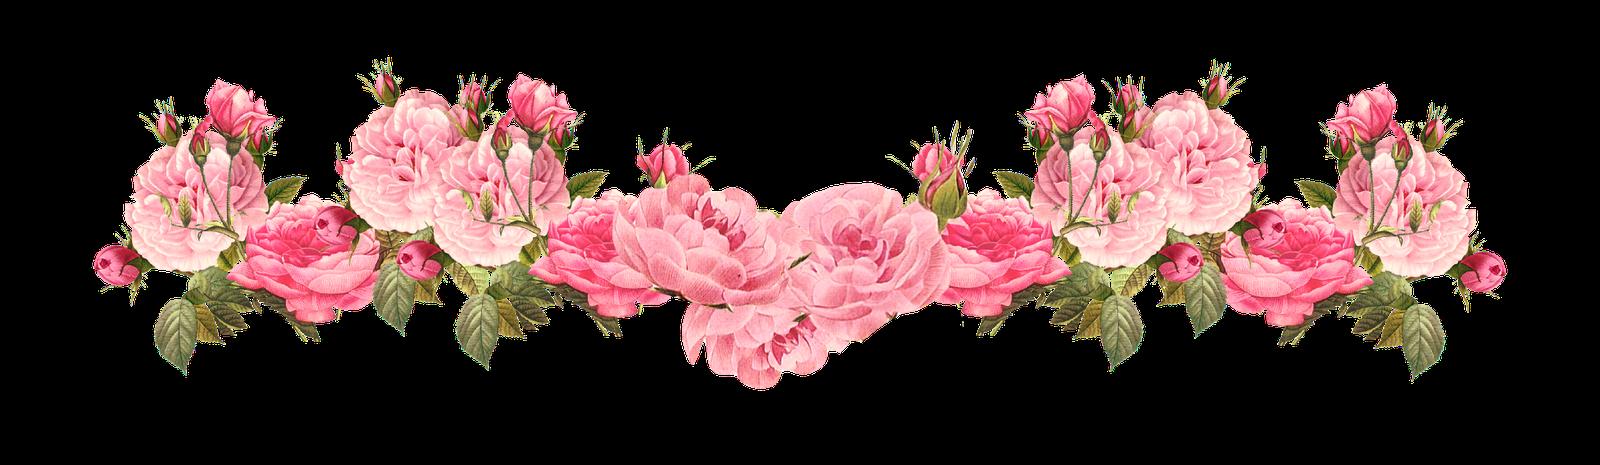 Vintage Pink Free Vintage Rose Borders Vintage Roses Scrapbooking Embellishment Vintage Roses Blue Shabby Chic Shabby Chic